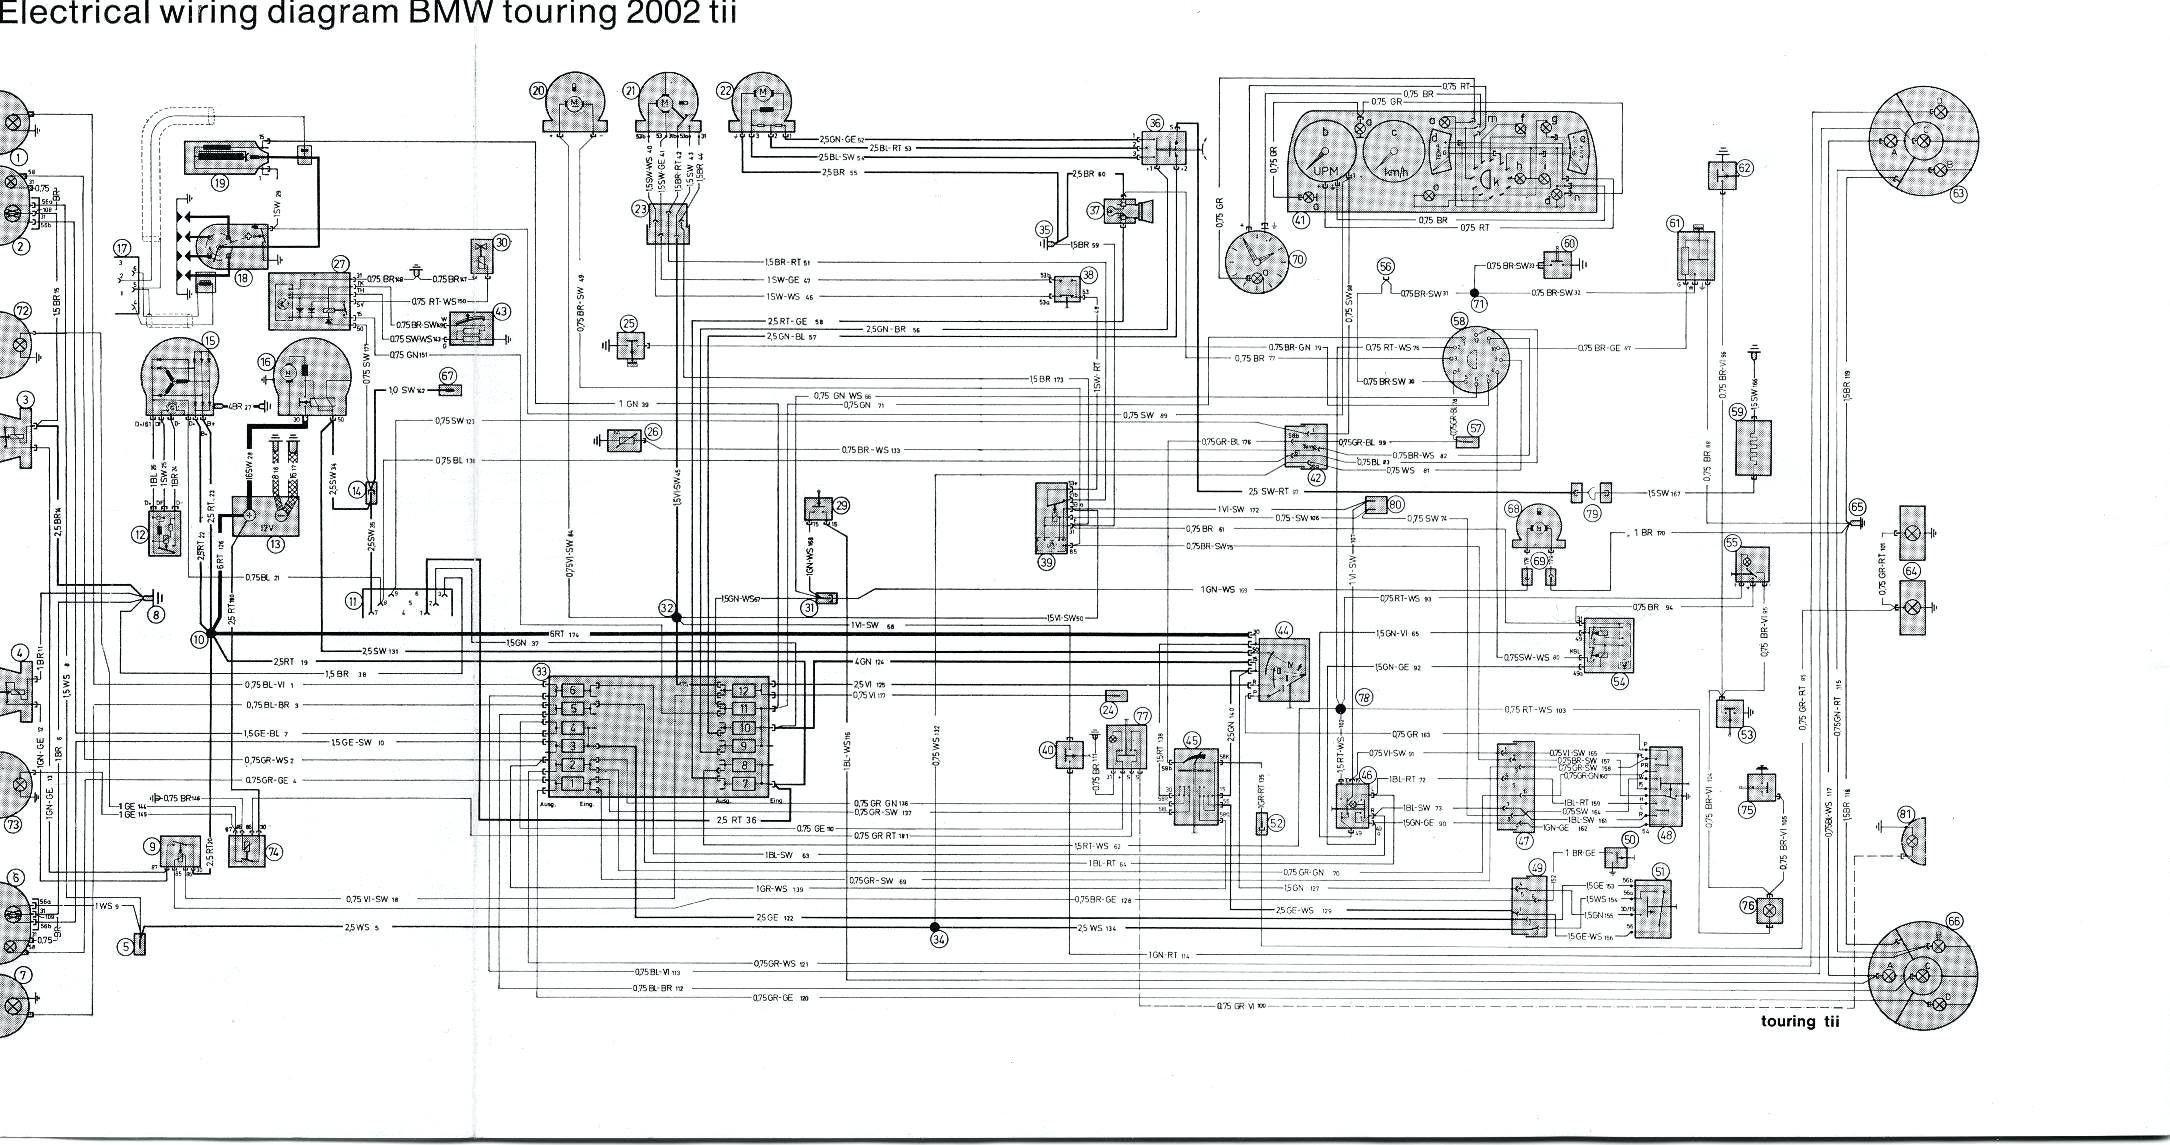 Bmw E46 Coupe Wiring Diagram #diagram #diagramtemplate #diagramsample | Bmw  e46, E46 coupe, New bmwPinterest